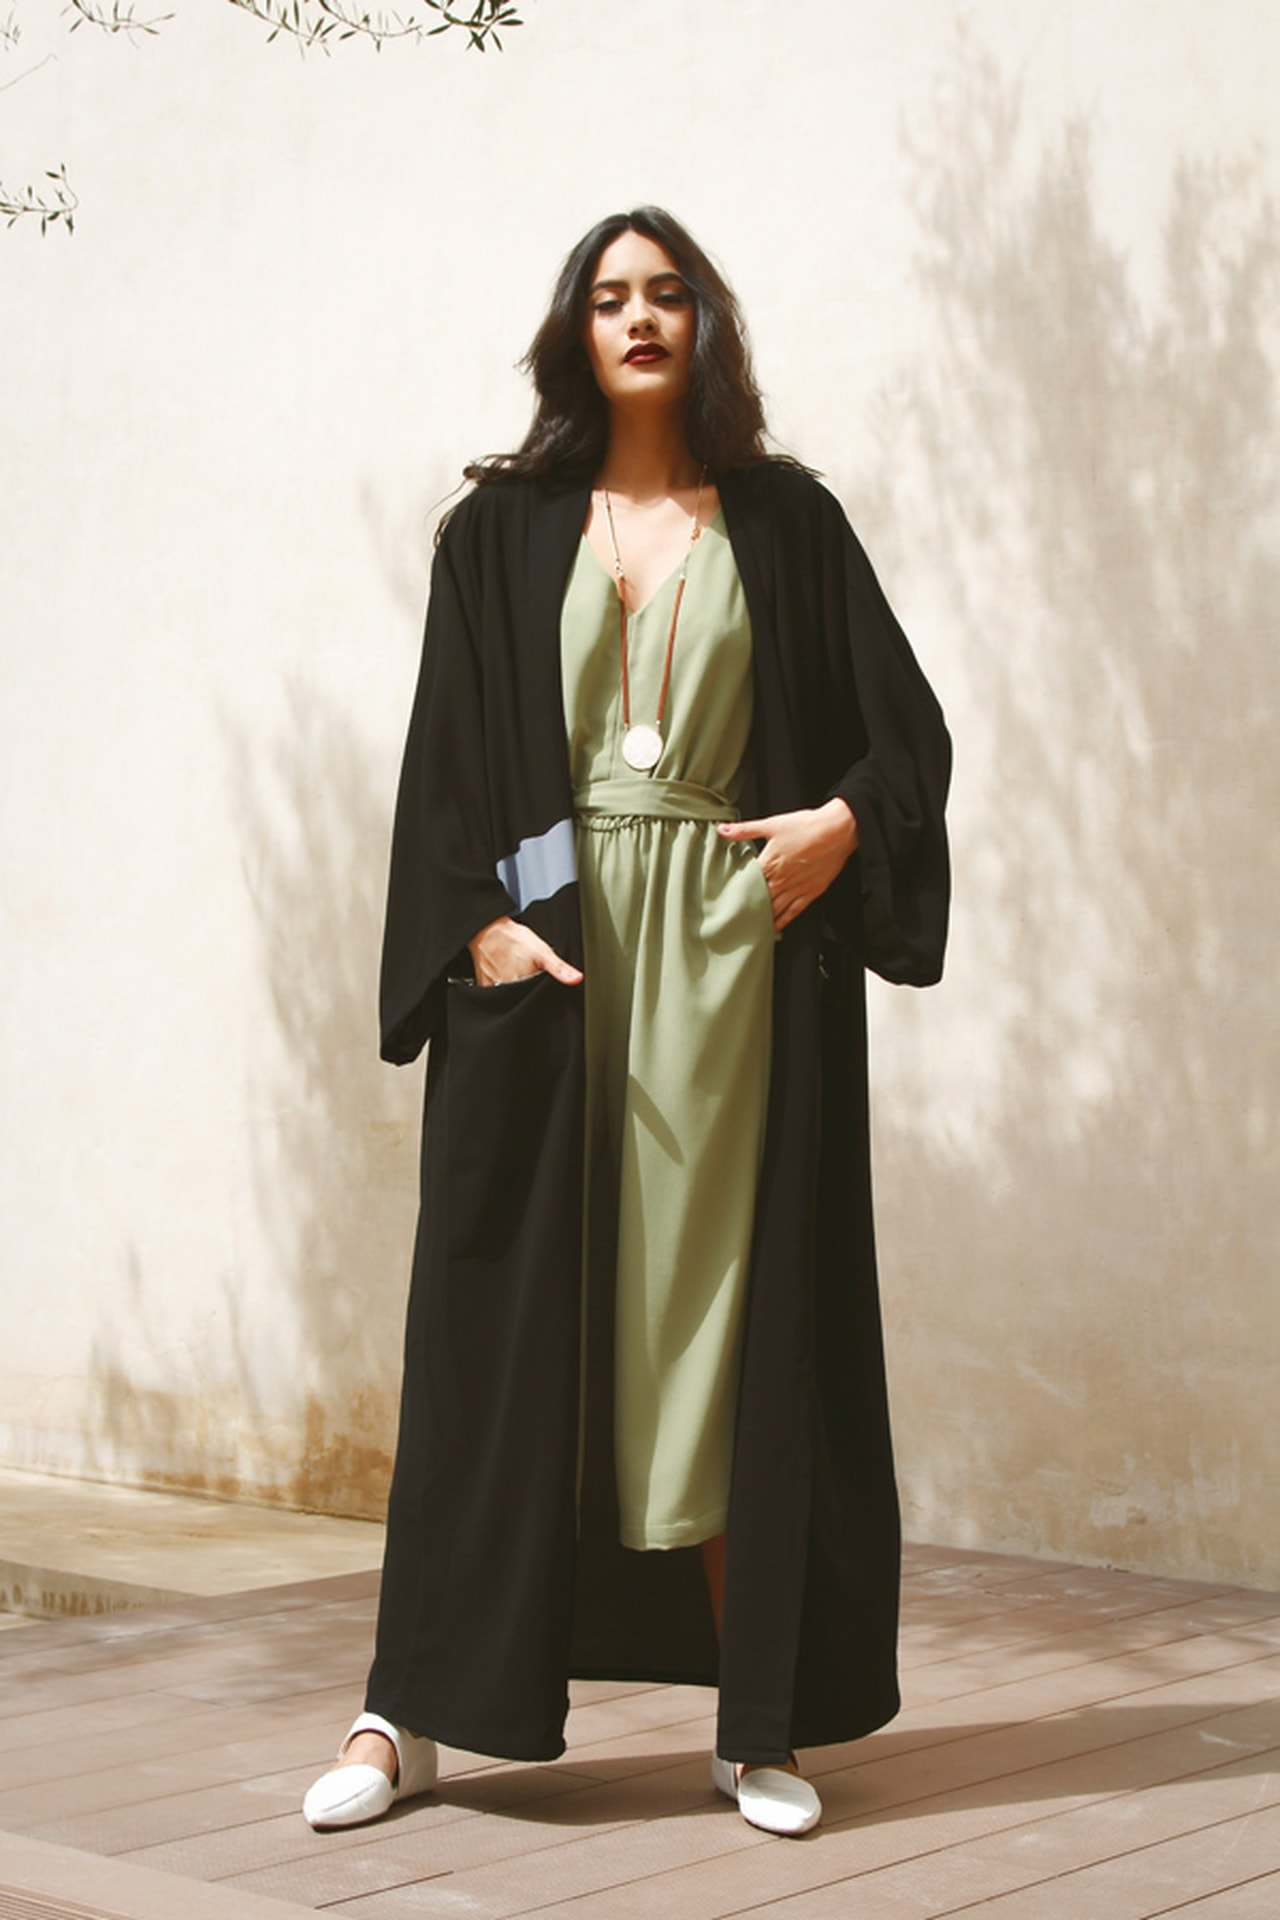 بالصور عبايات اماراتية , ملابس نساء اماراتيه رائعه 4288 2